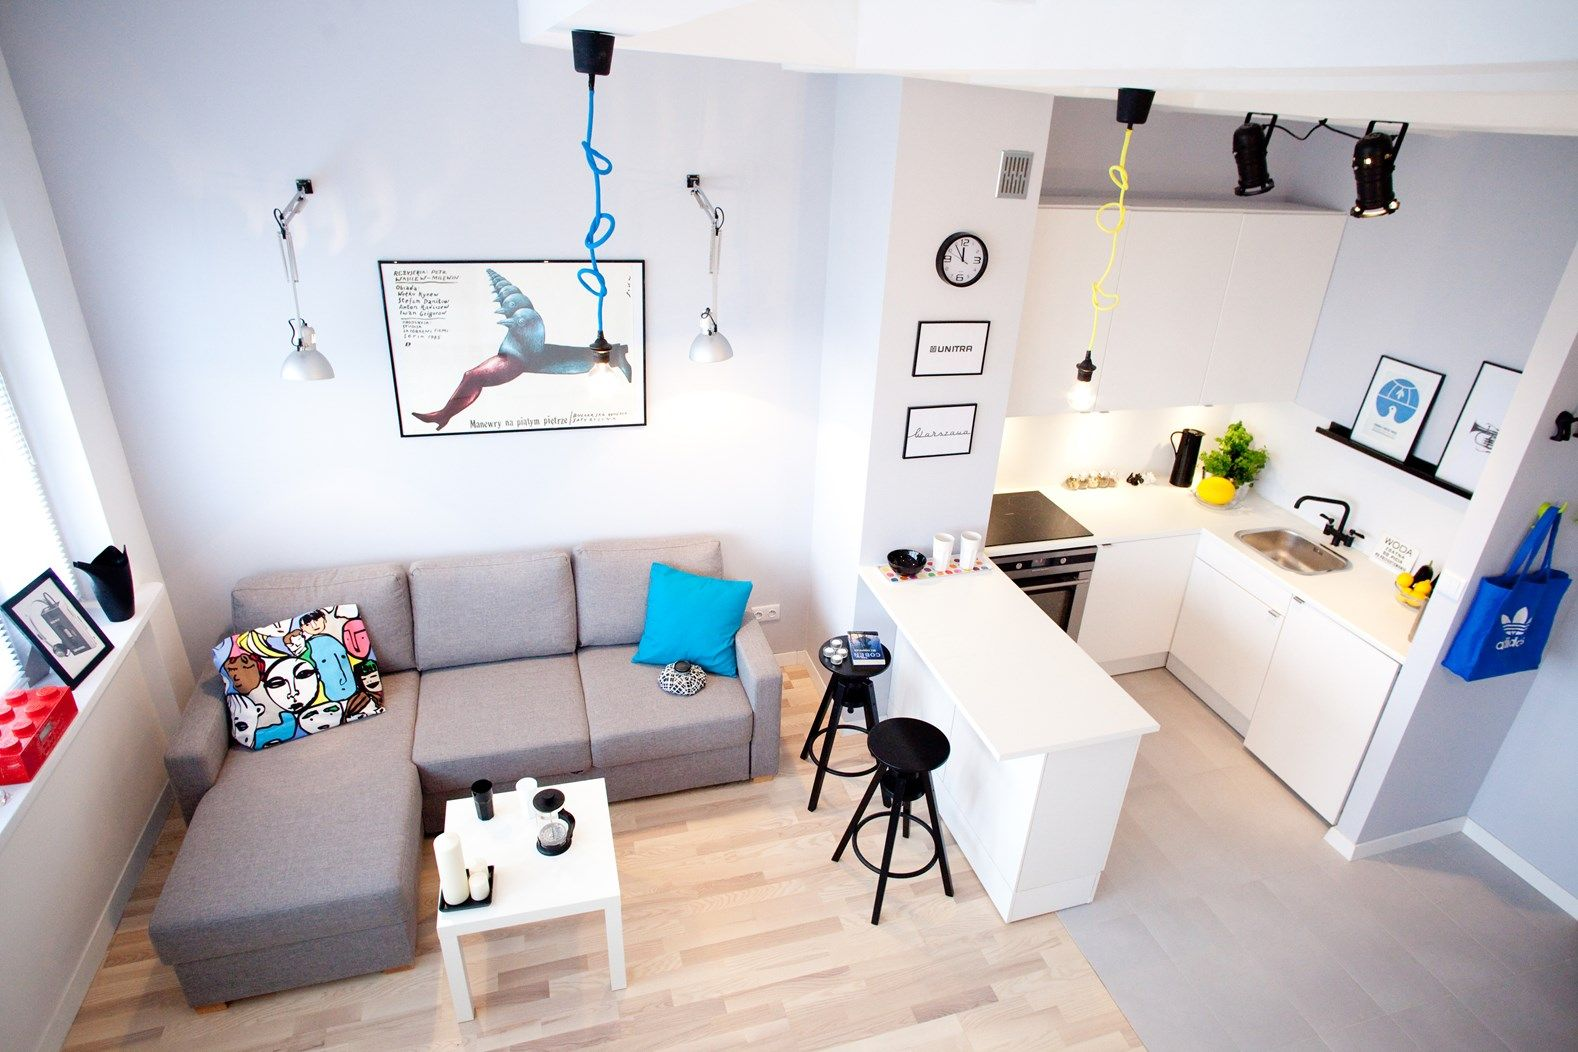 kawalerka tostoja salon styl nowoczesny kazaneckapl - Modernes Wohnzimmer Des Innenarchitekturlebensraums